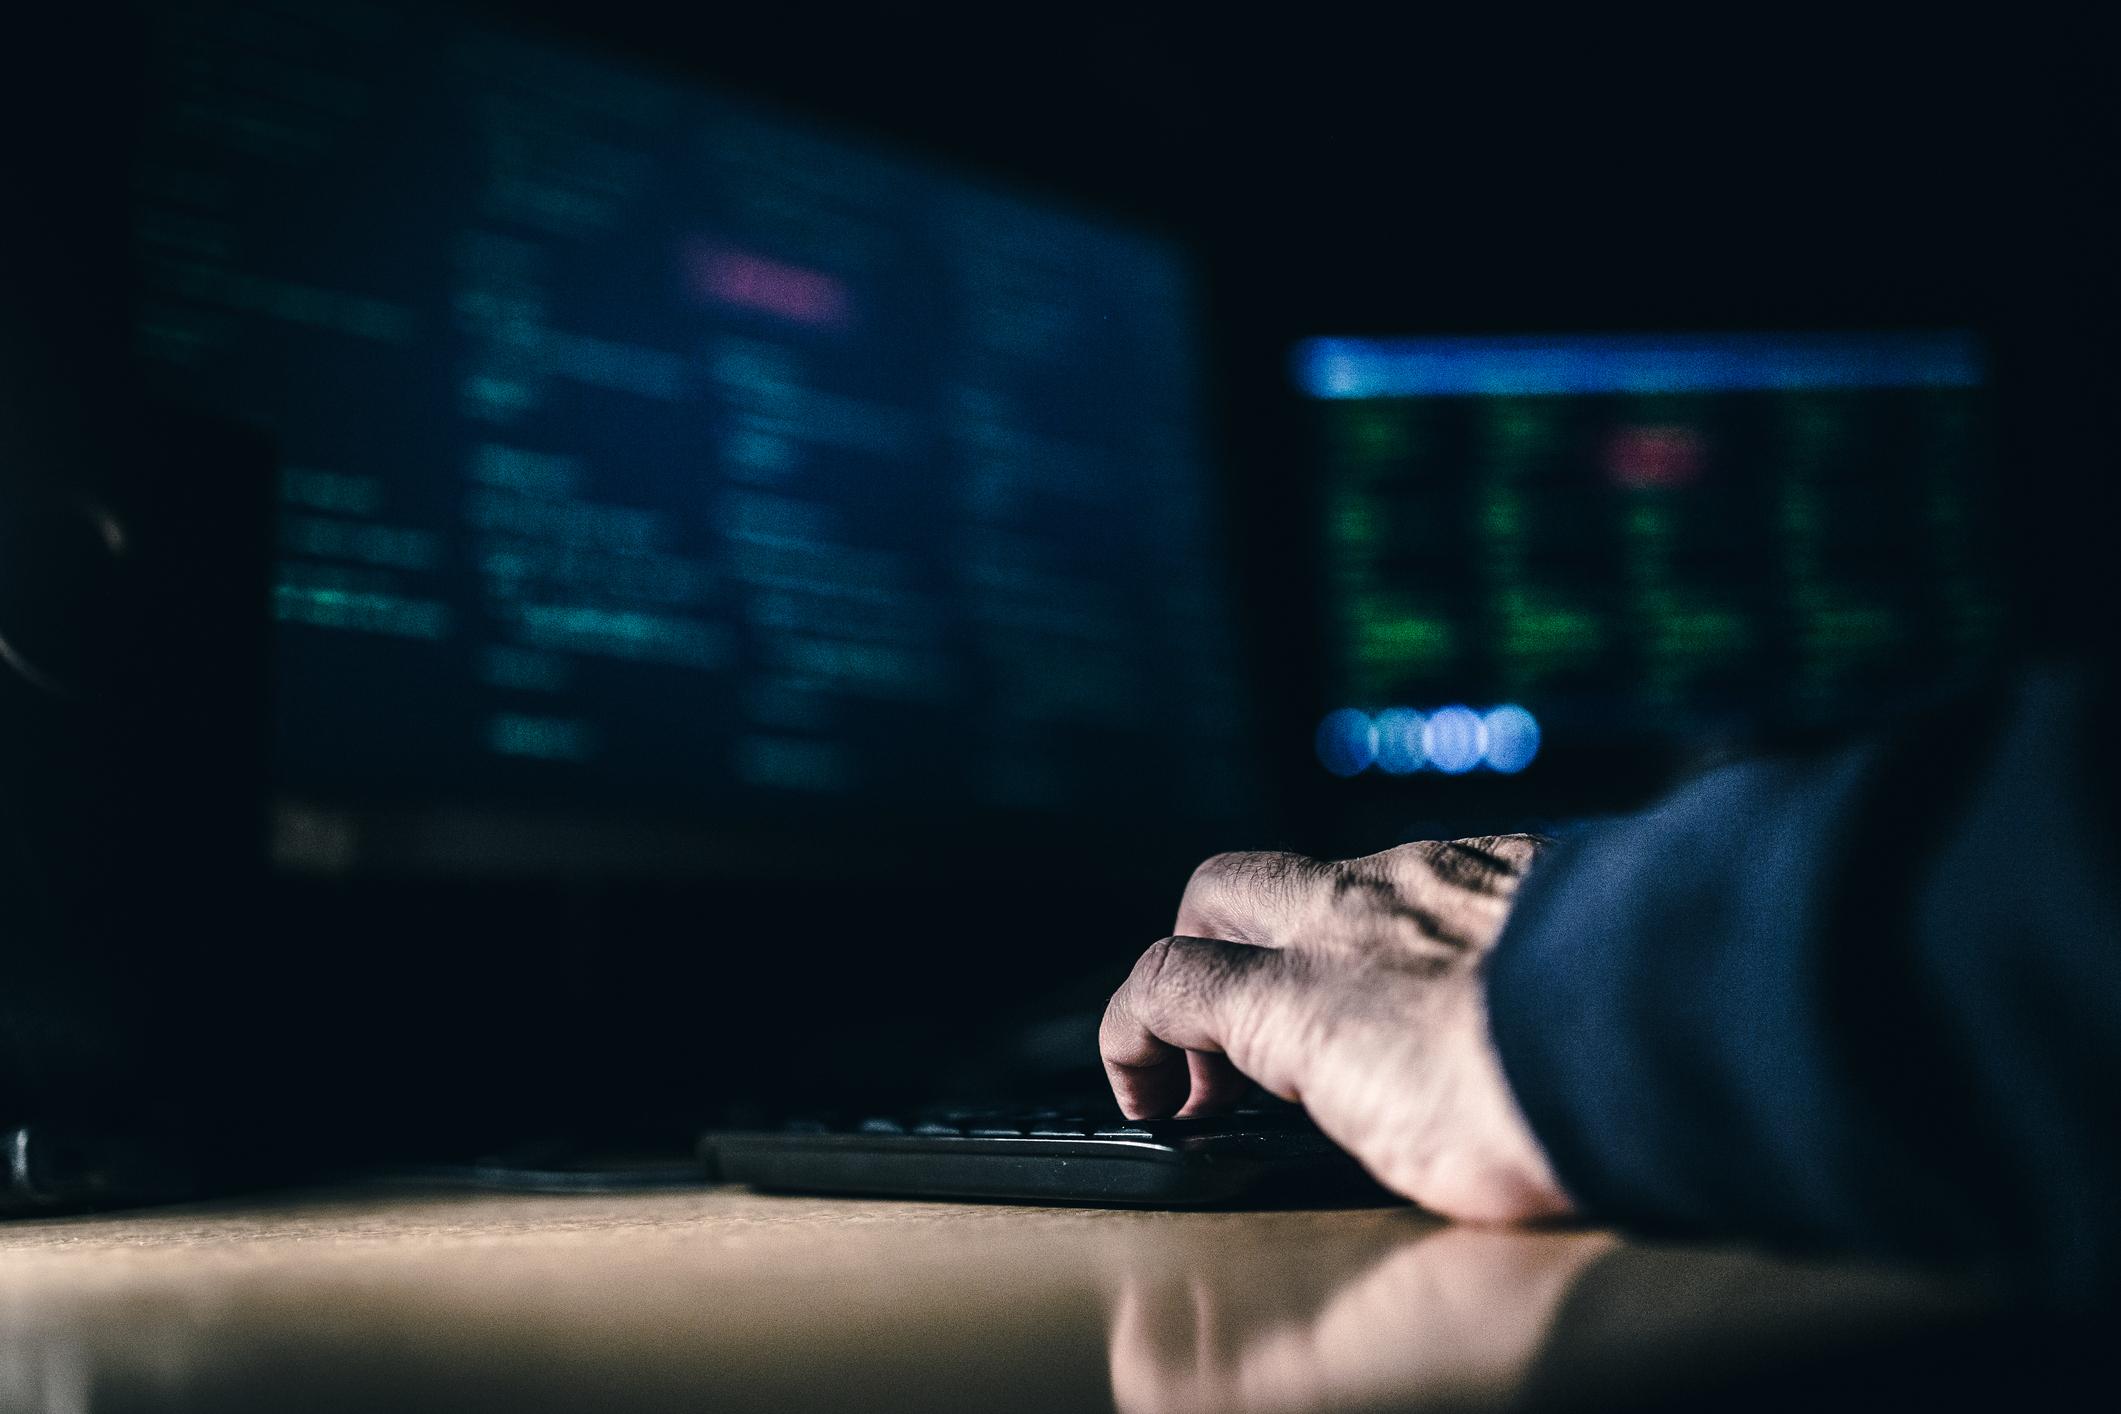 Tech Industry Trade Secrets Case to Proceed - Tech